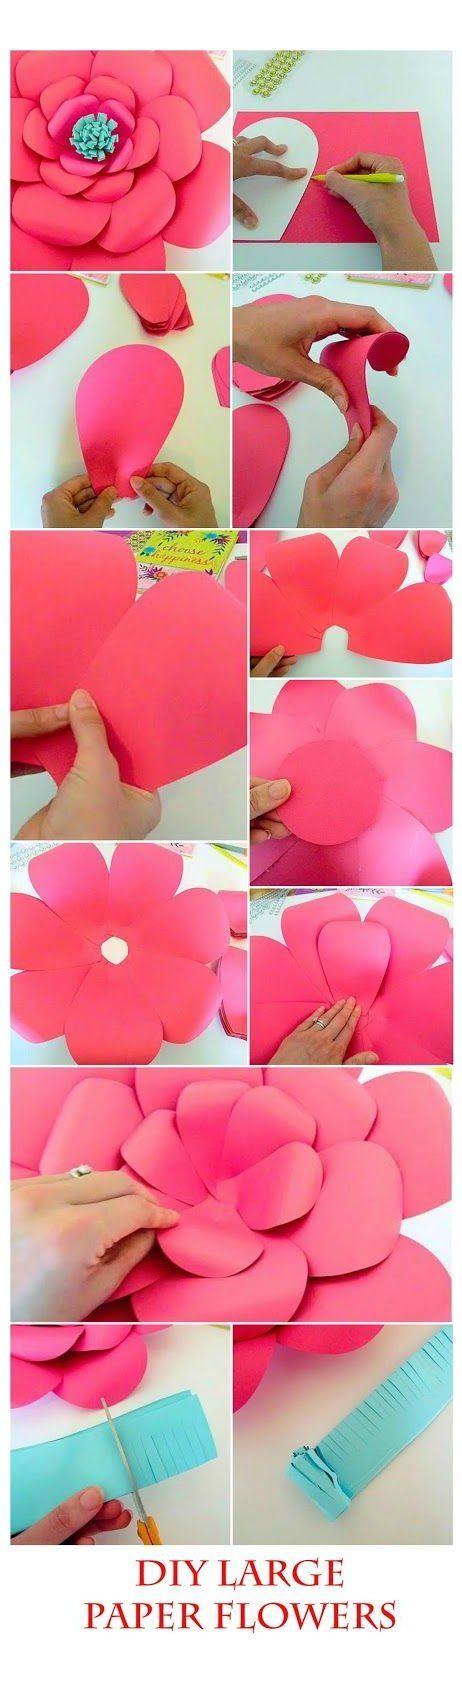 Mama's Gone Crafty: Easy Method When Building any DIY Giant Paper Flower #flowerdiy